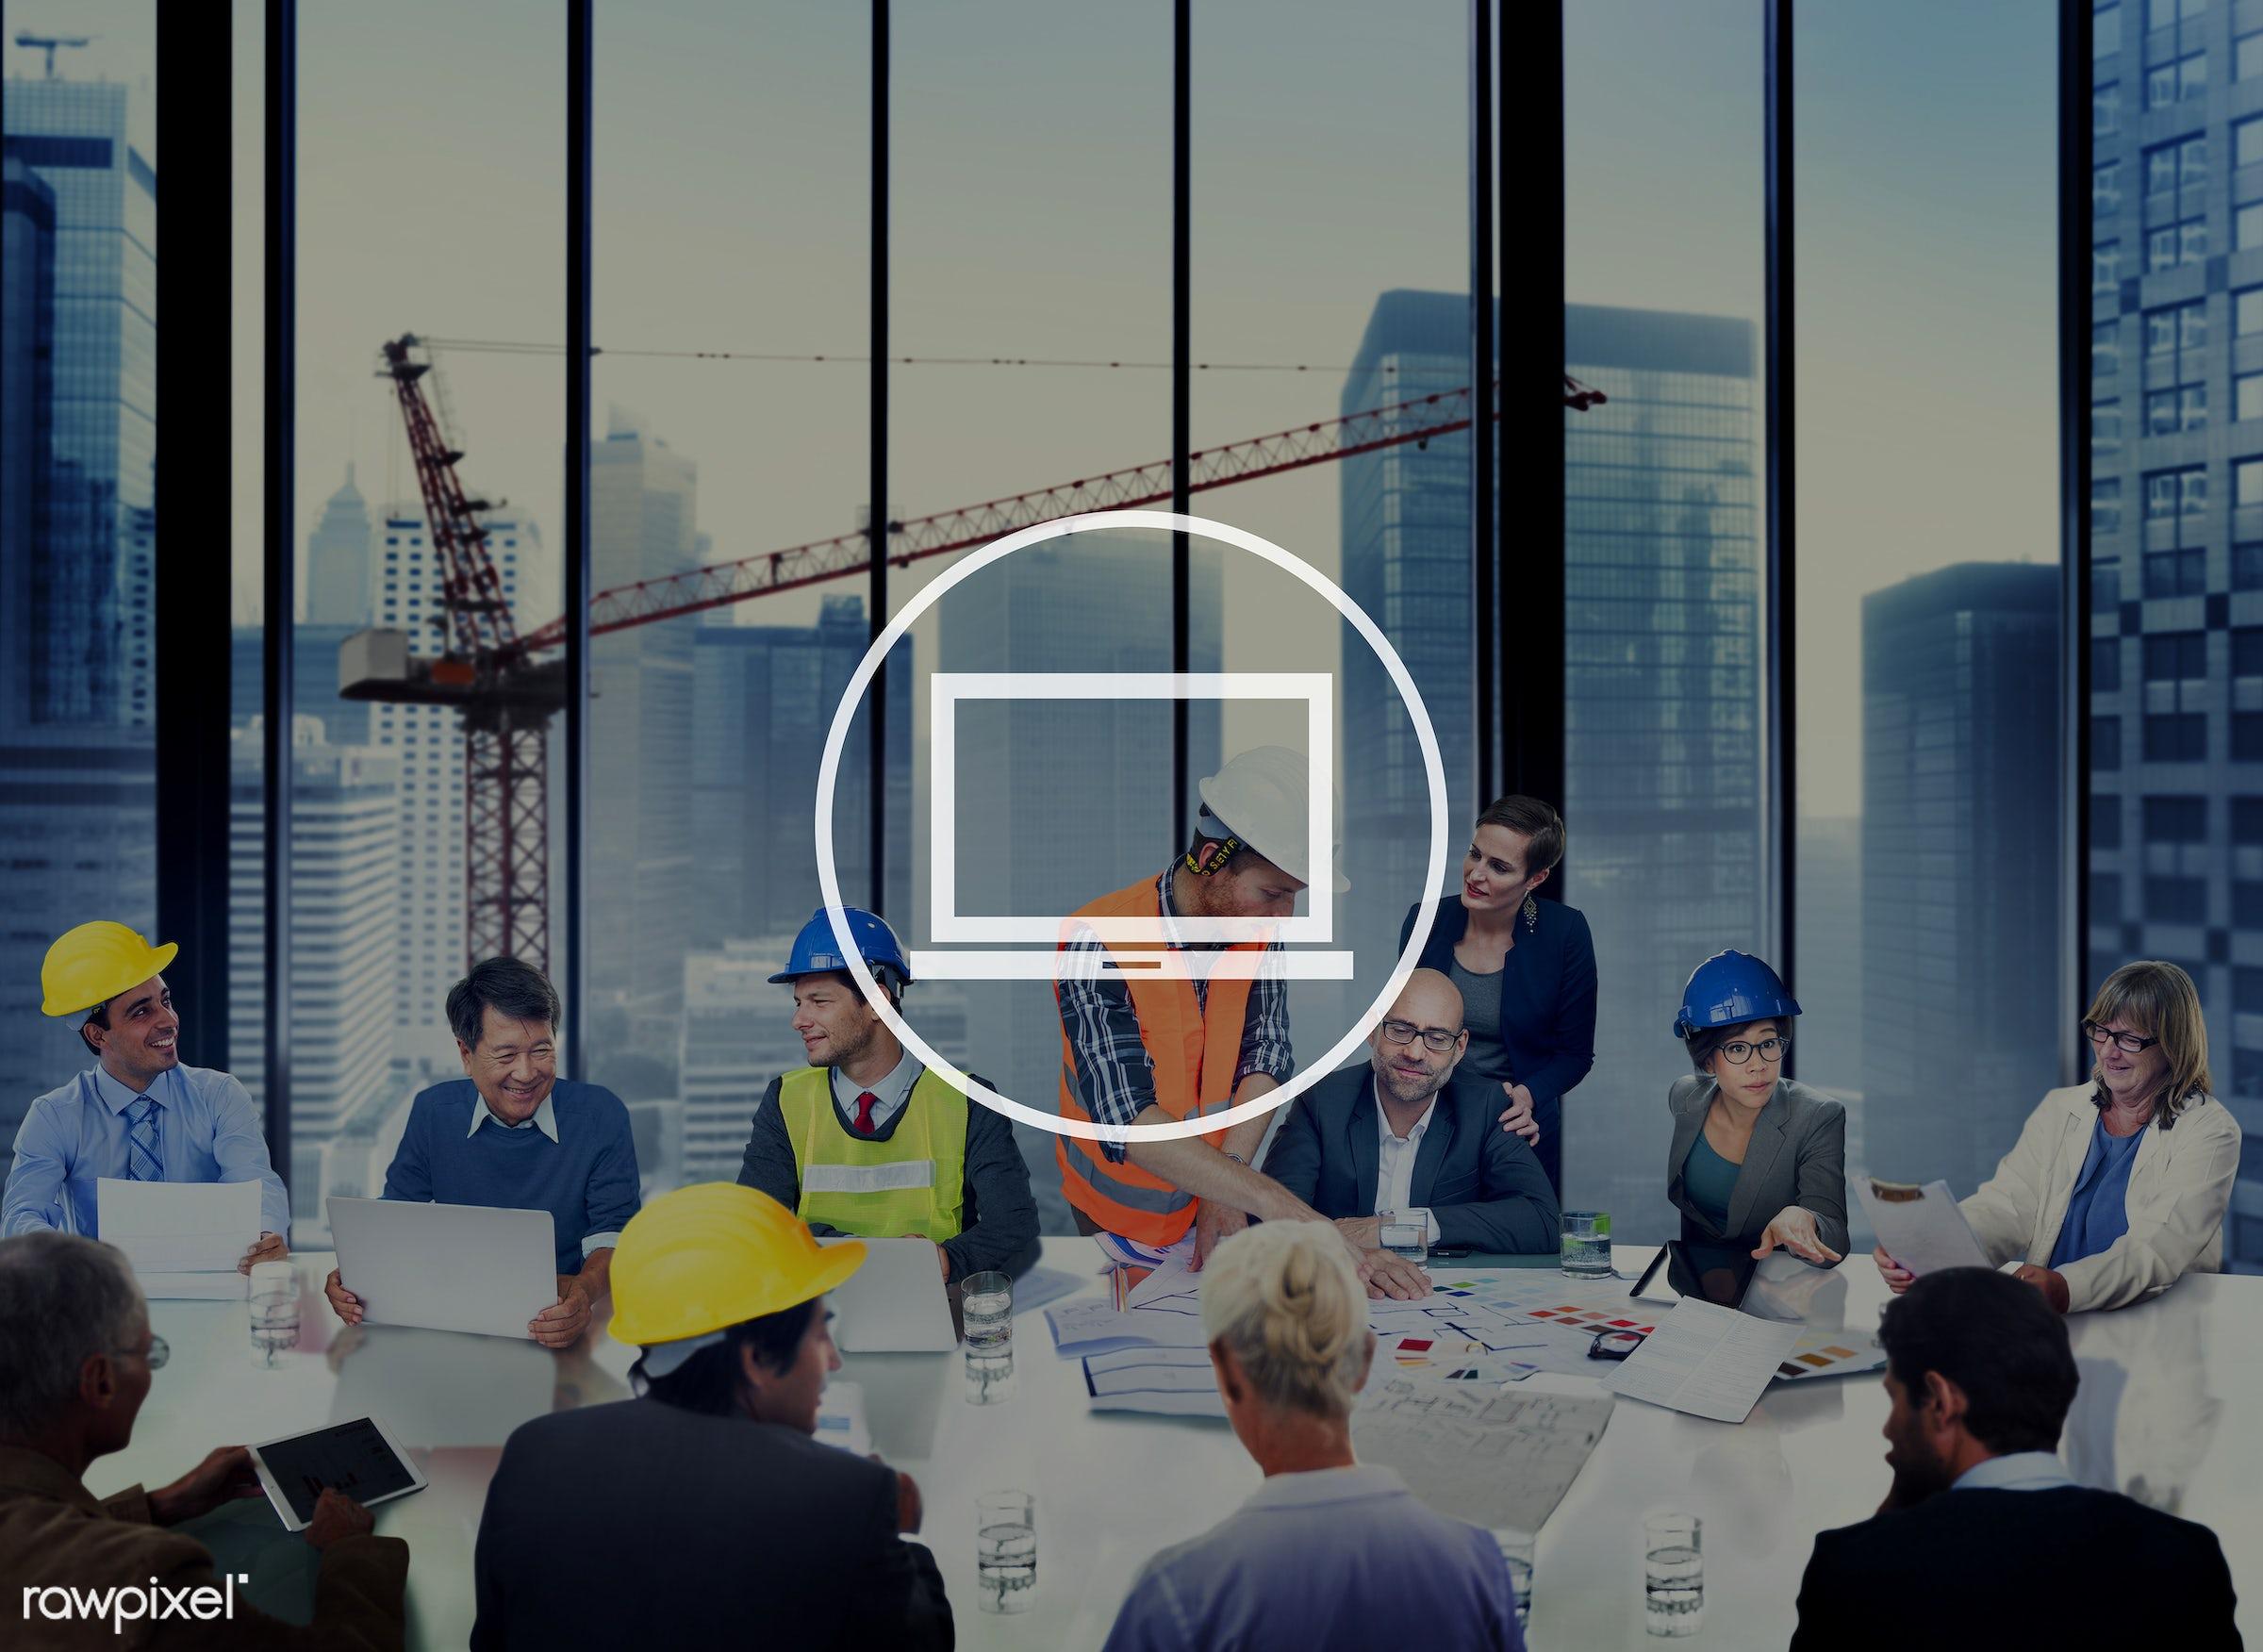 engineer, blueprint, architect, asian ethnicity, brainstorming, building, business, business people, businessmen,...